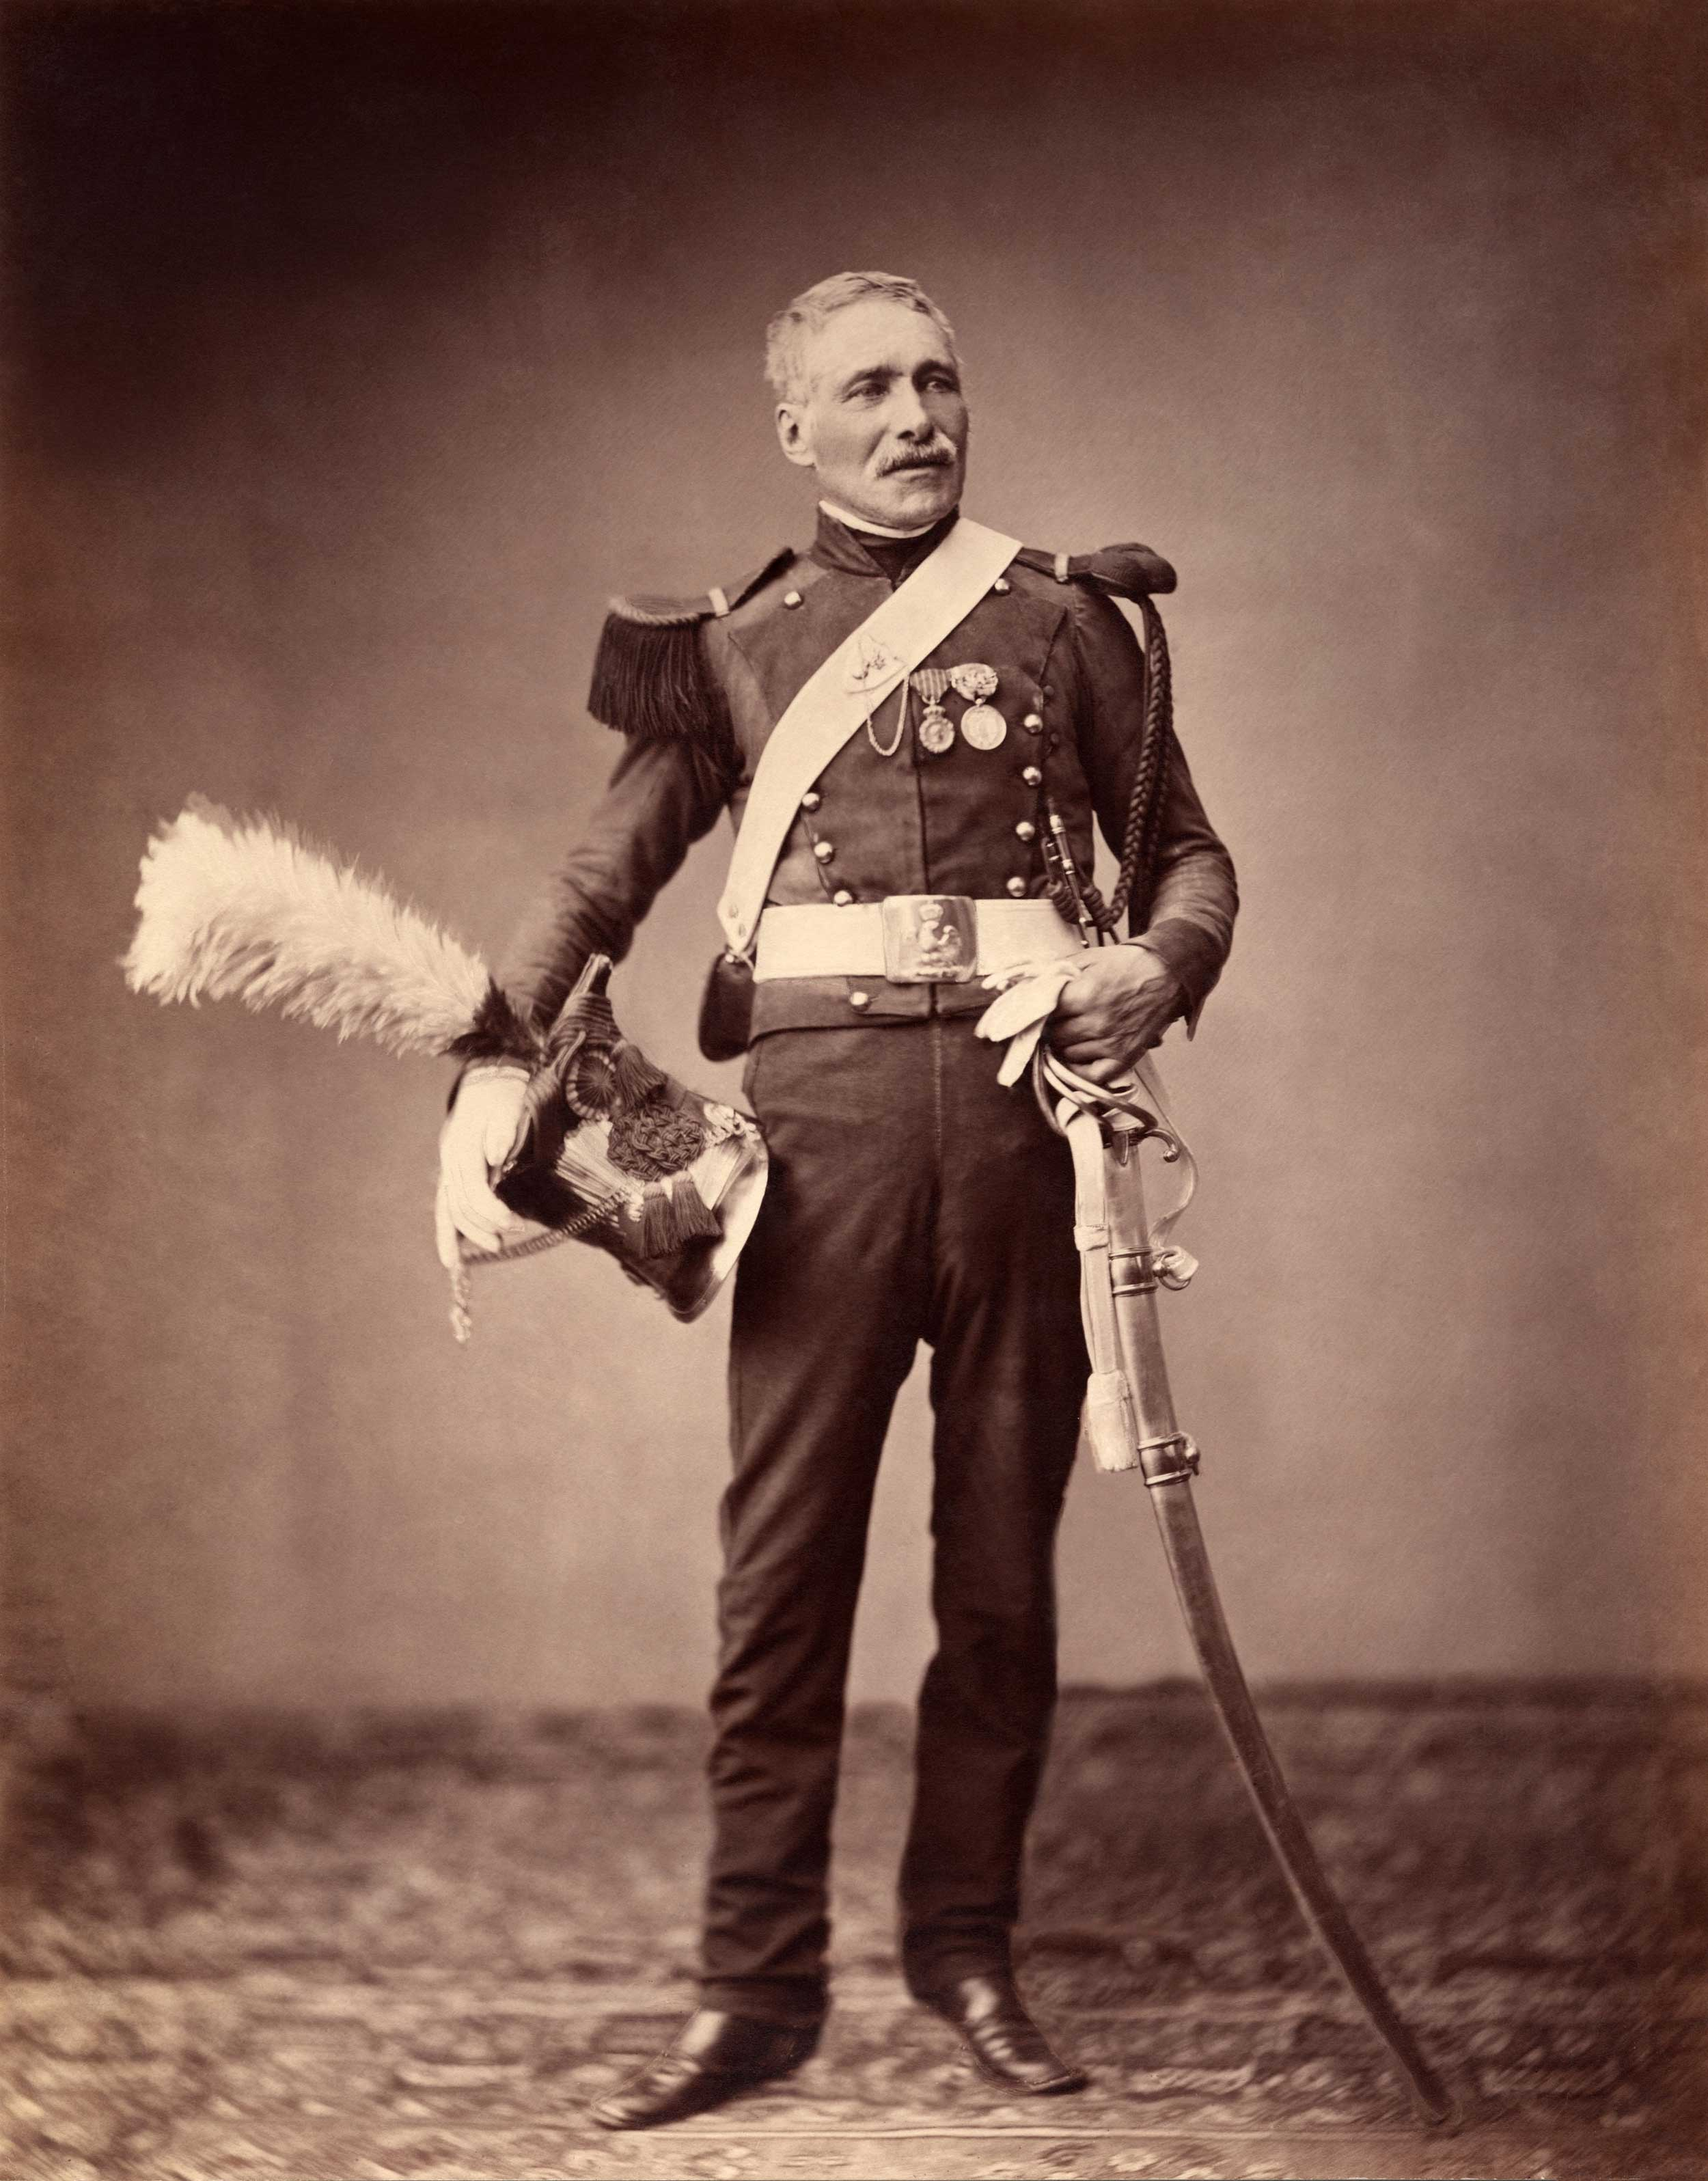 Monsieur Dreuse of 2nd Light Horse Lancers of the Guard, c. 1813-14